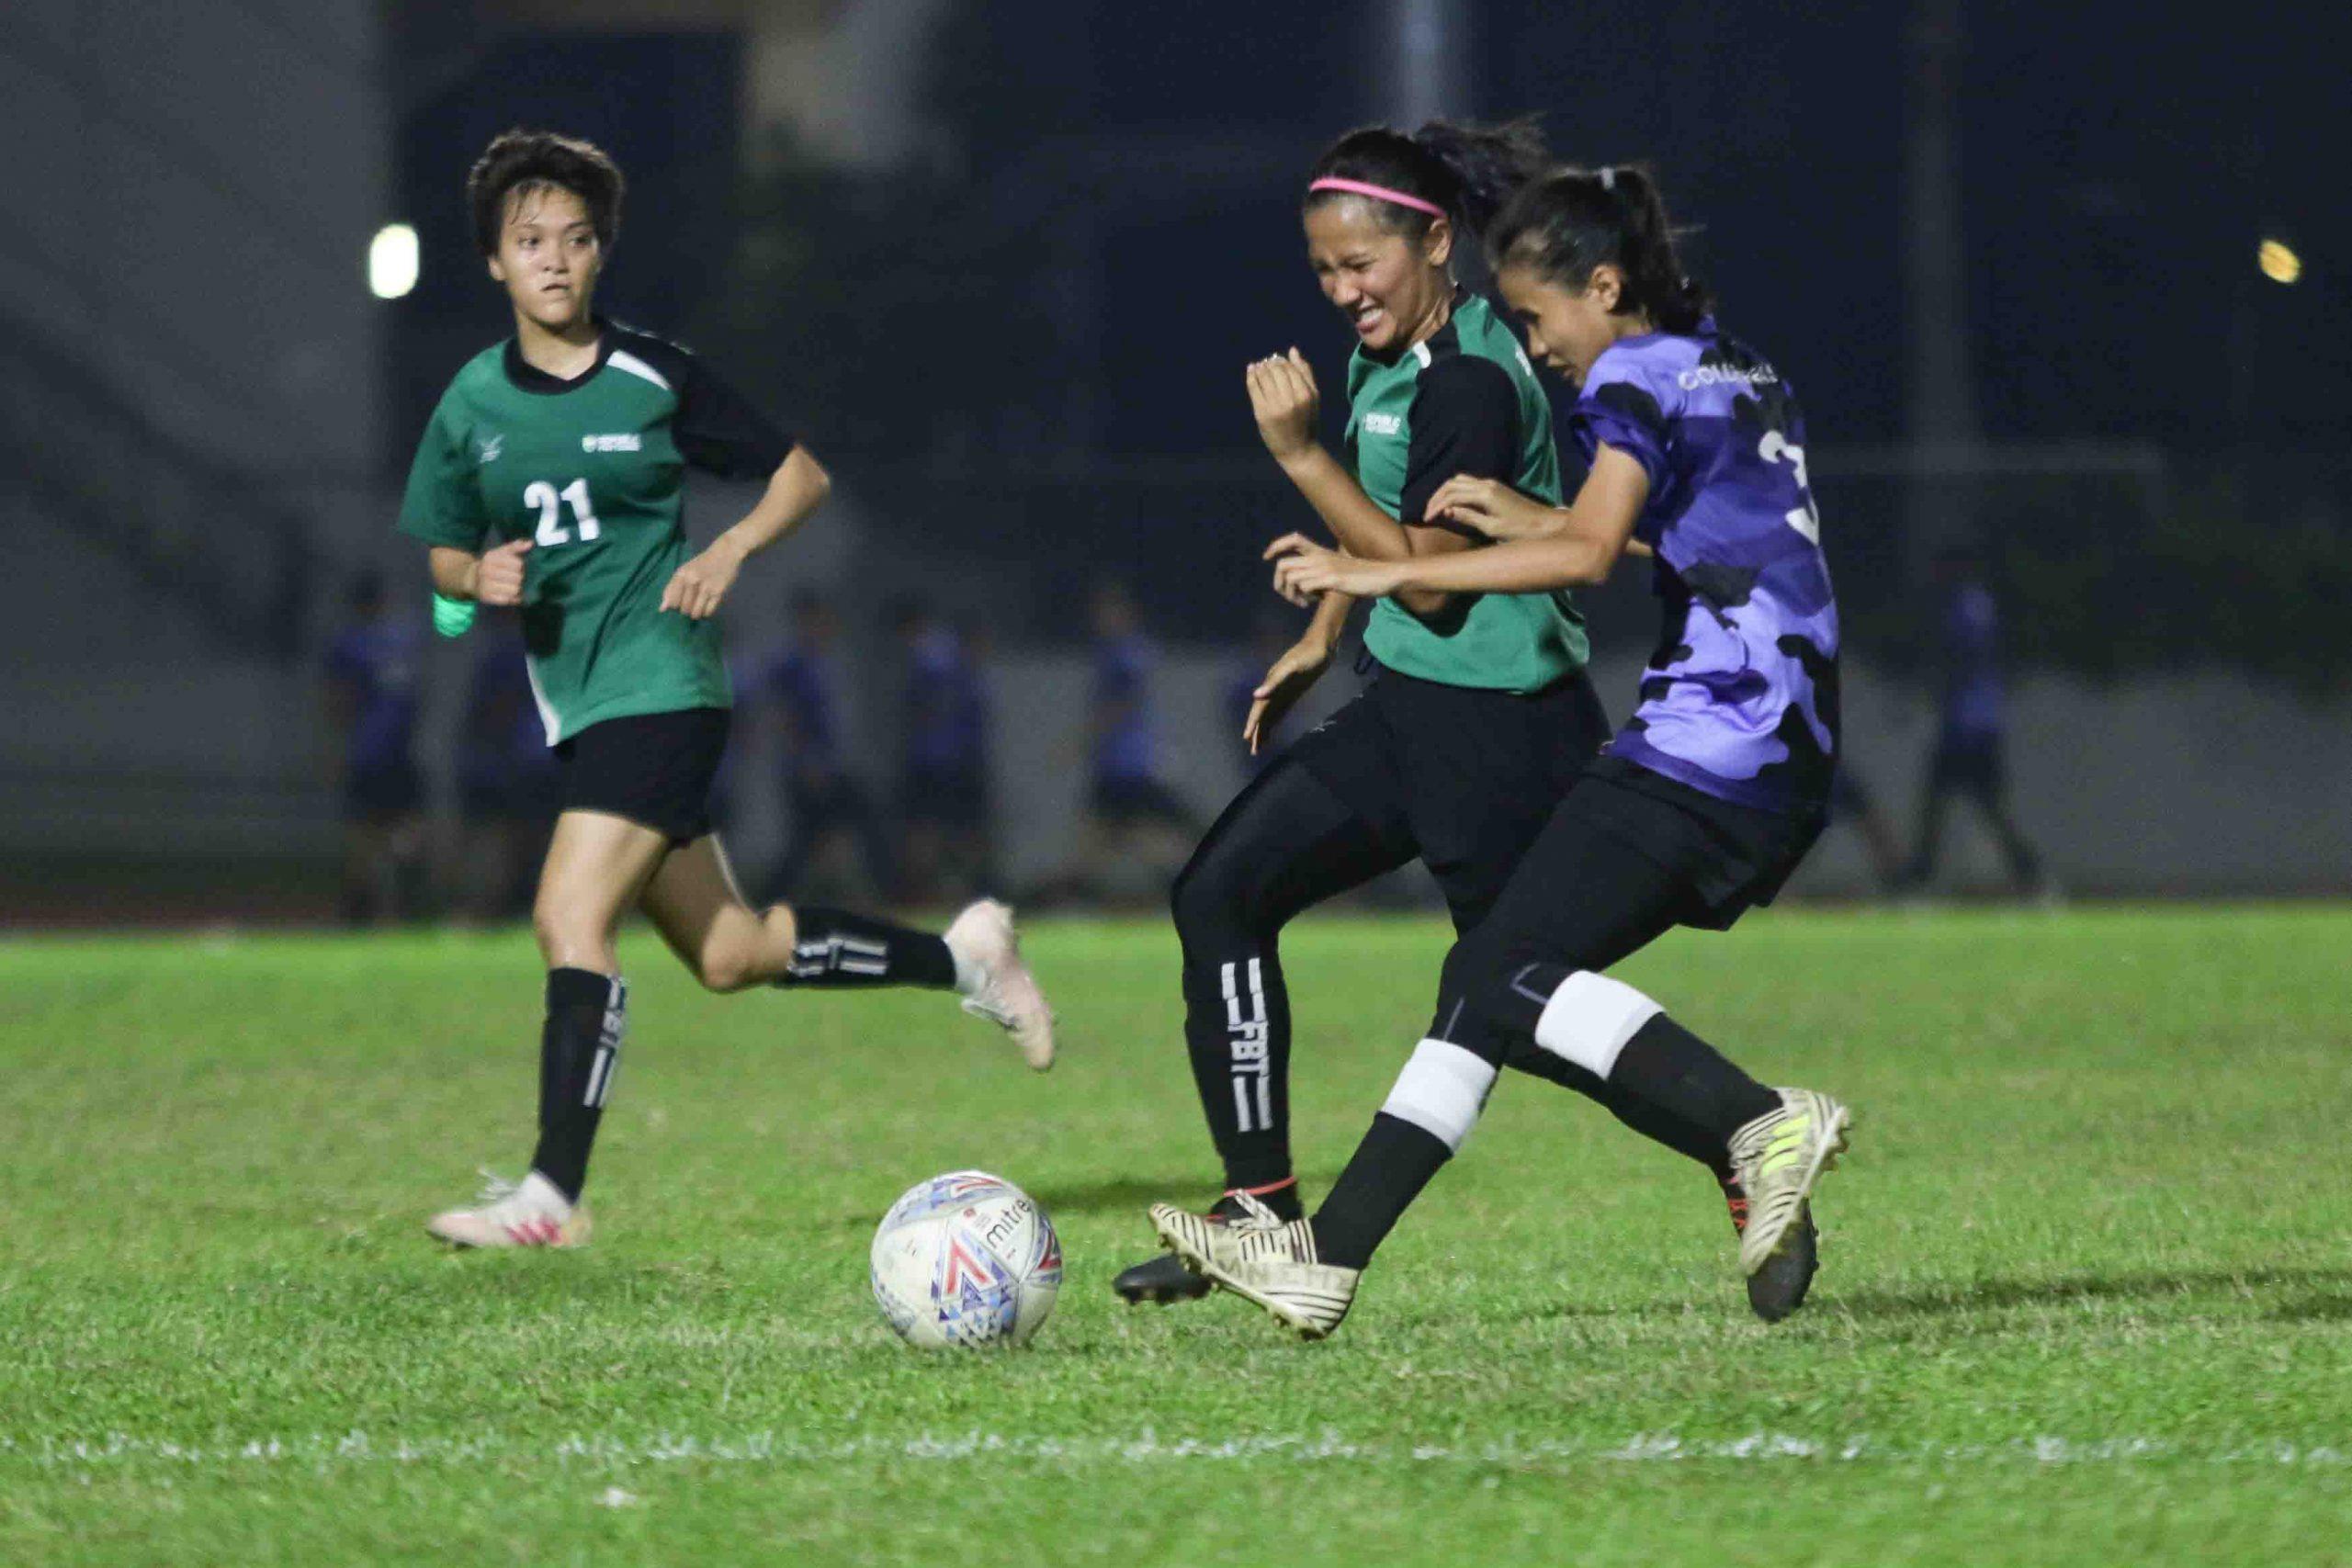 Nur Jannah Bte Khamis (ITE #3) and Nur Izzati Binte Rosni (RP #13) competes for possession. (Photo 3 © Clara Lau/Red Sports)